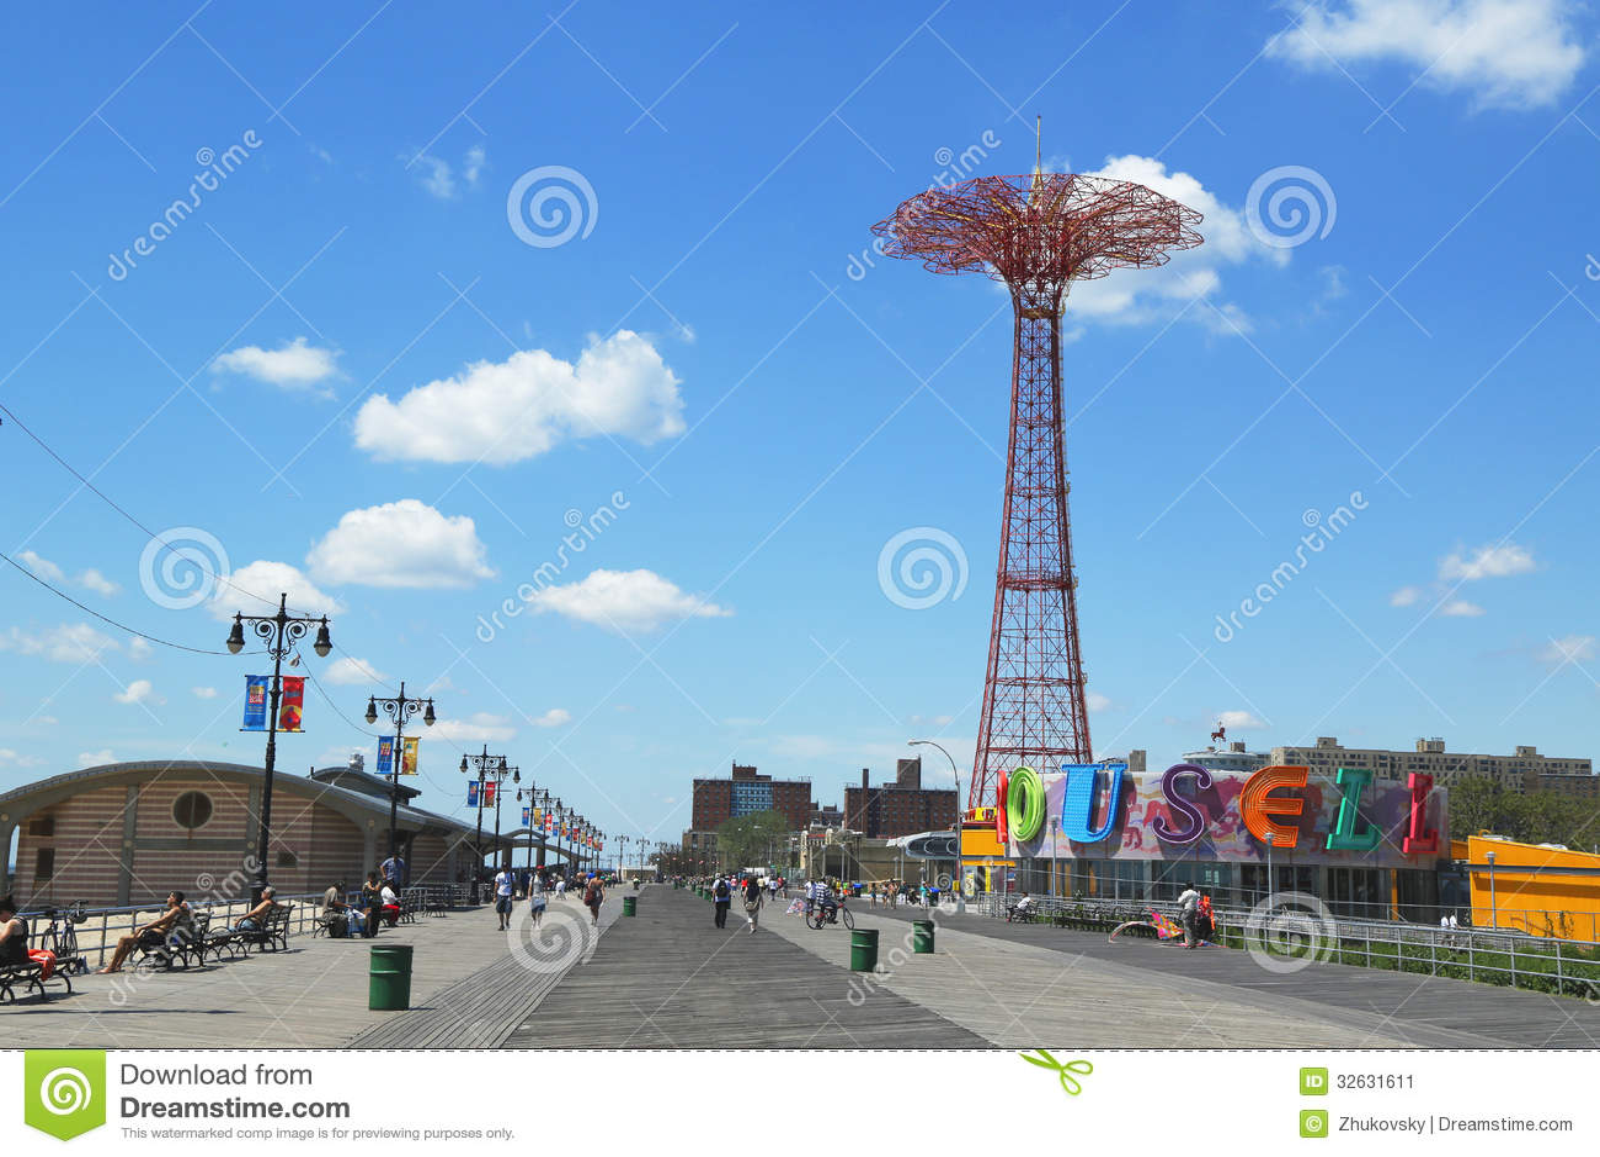 Coney Island Boardwalk, parachute jump tower and restored historical B&B carousel in Brooklyn